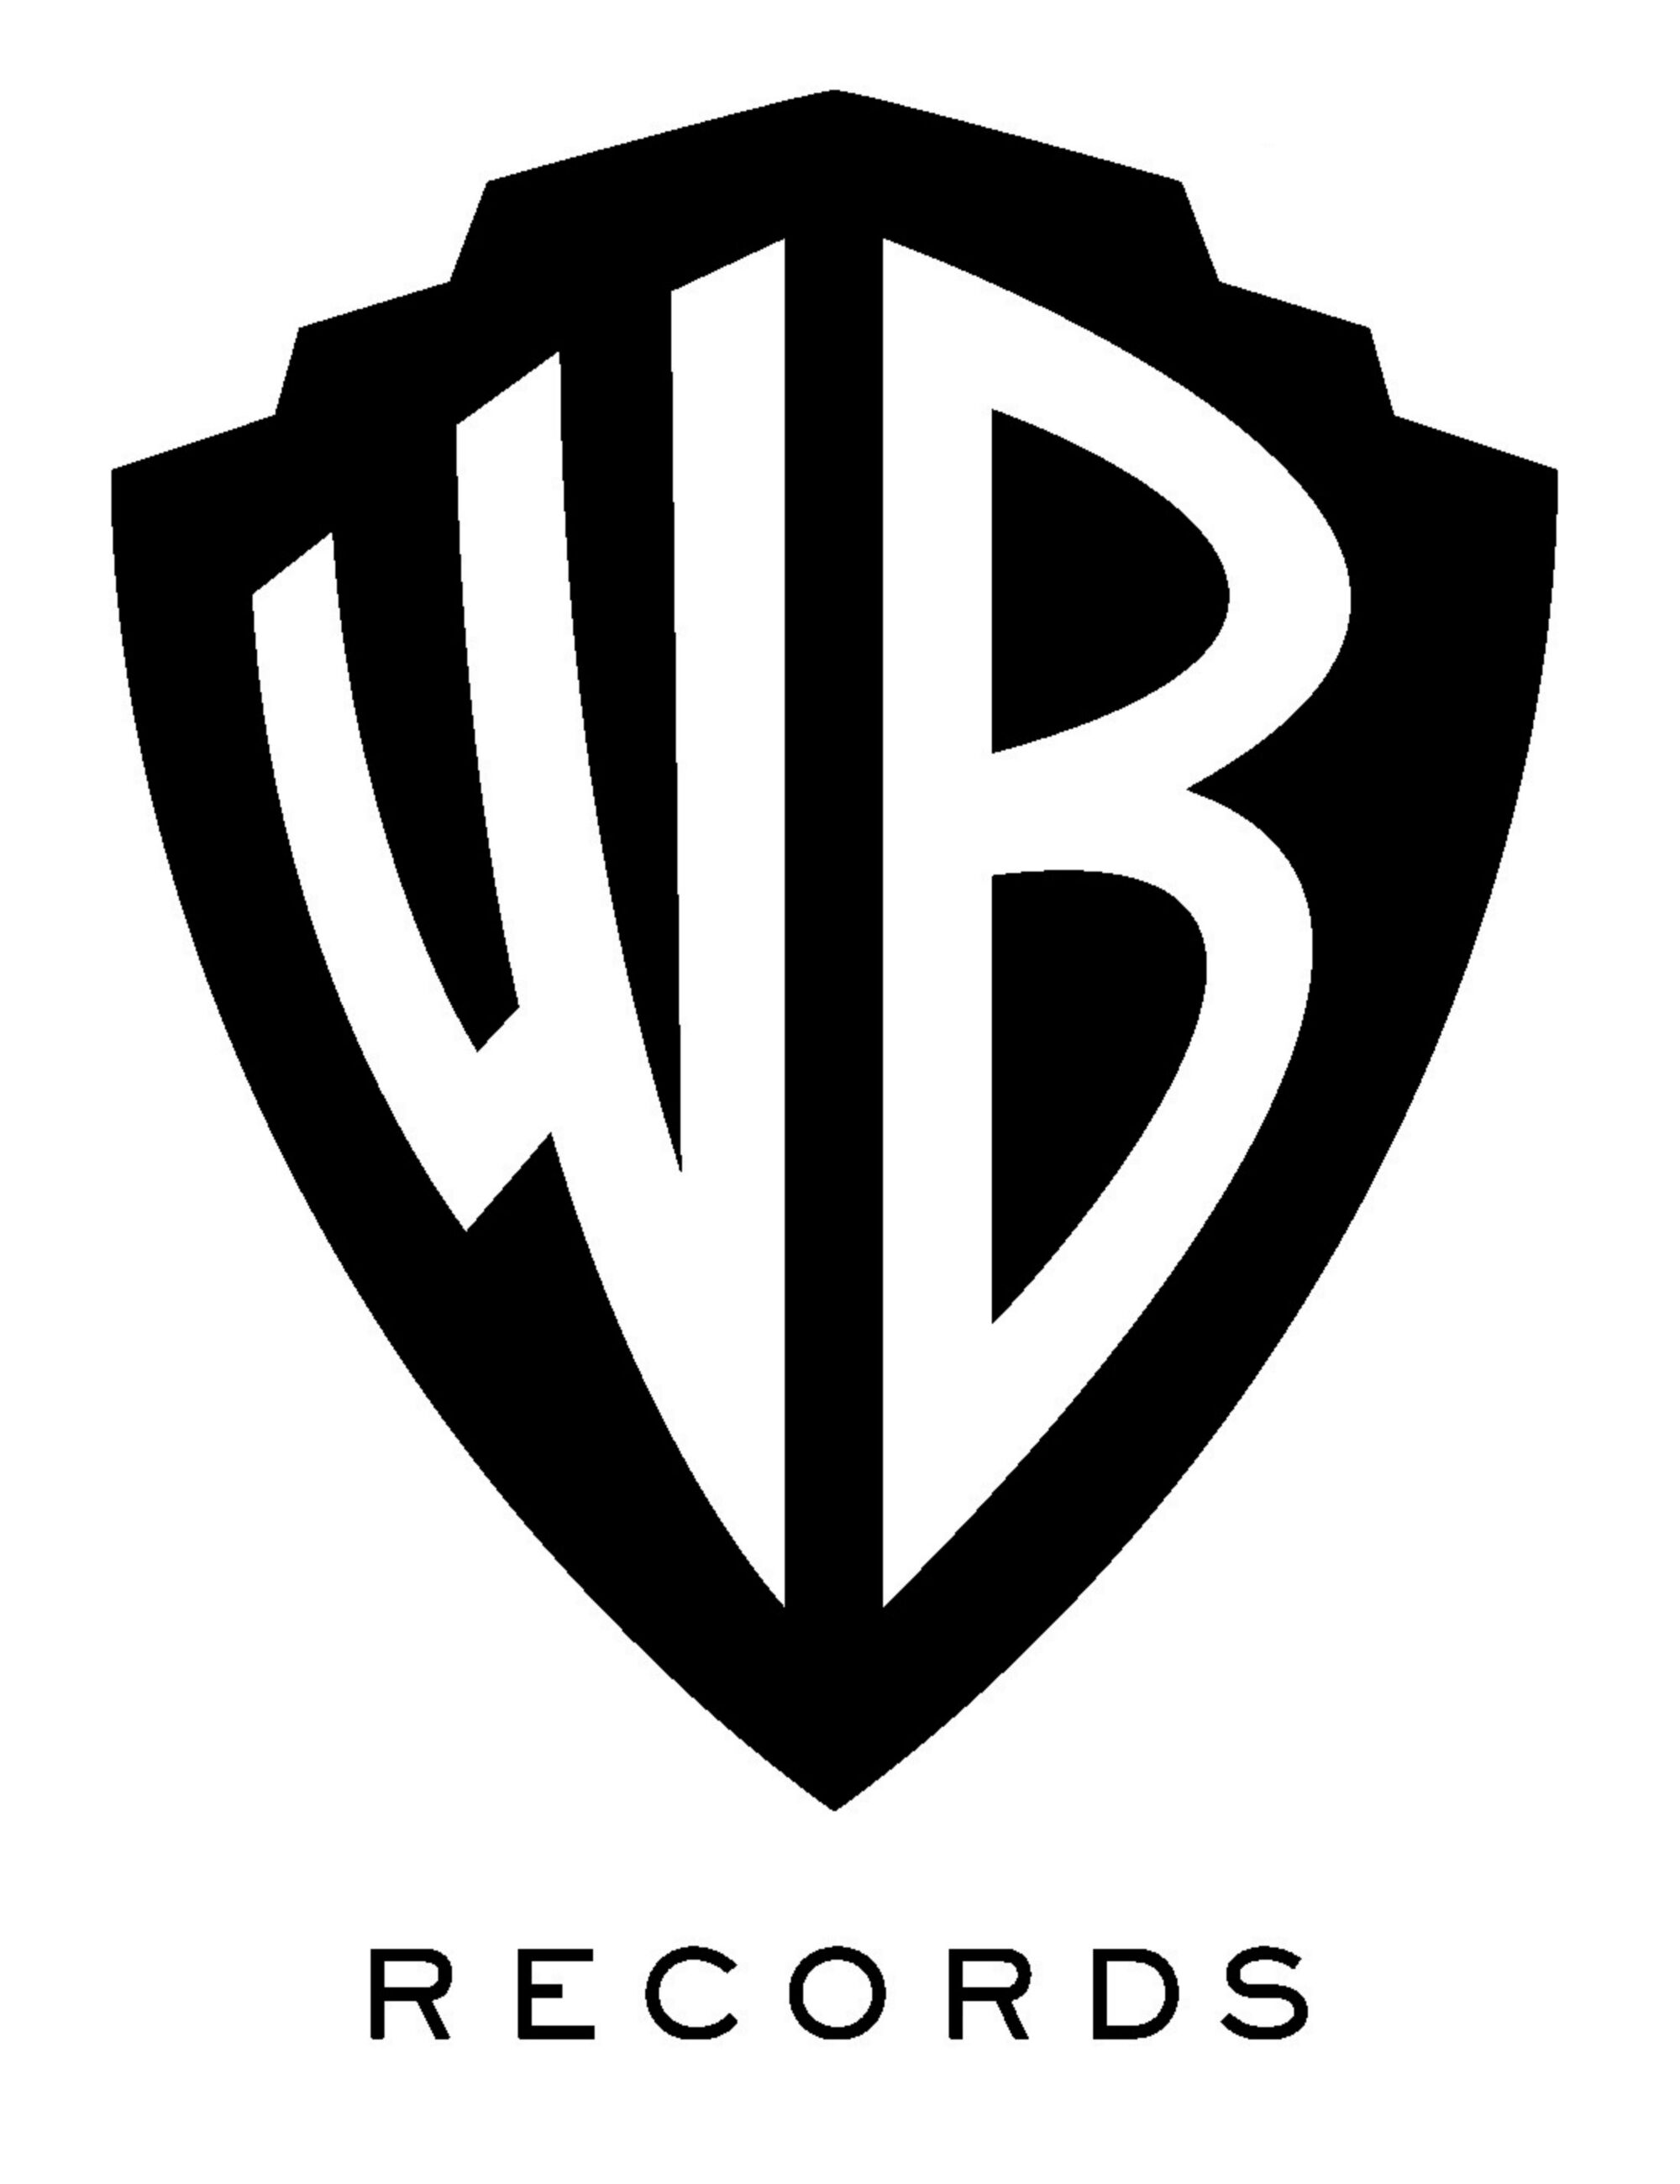 Warner bros records duran duran wiki fandom powered by wikia records duran duran wiki fandom powered by wikia buycottarizona